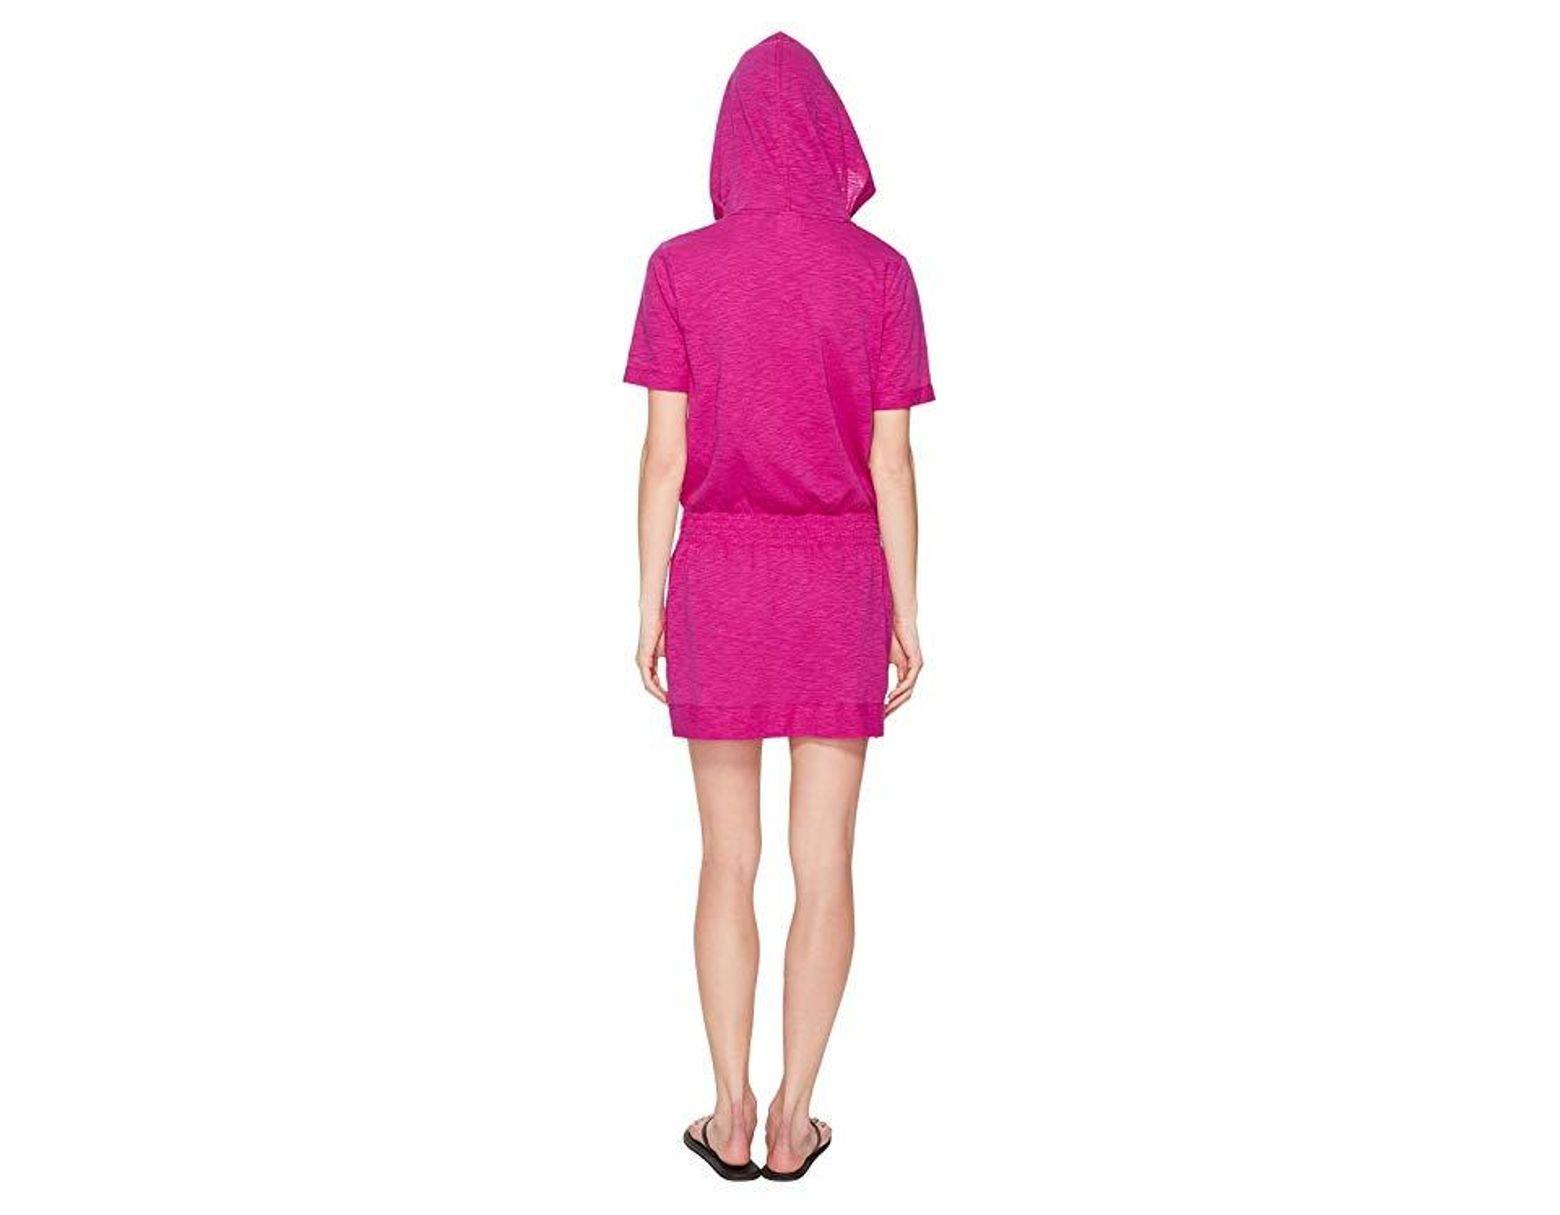 b3163bb64f07e Speedo Hooded Cover-up (very Fuchsia) Swimwear in Purple - Lyst